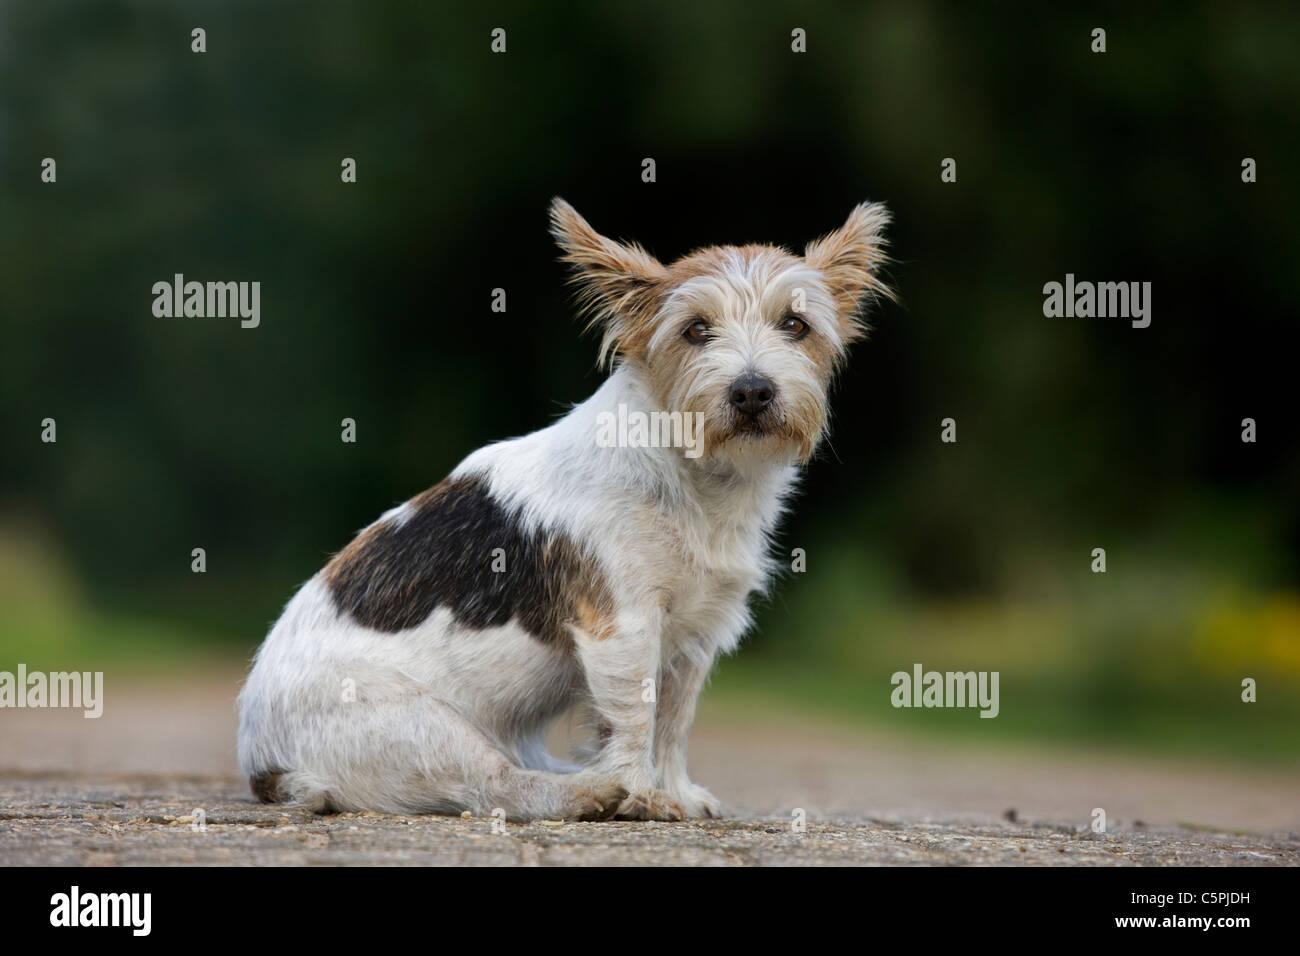 Rough-rivestito Jack Russell Terrier (Canis lupus familiaris) seduto sul percorso Immagini Stock